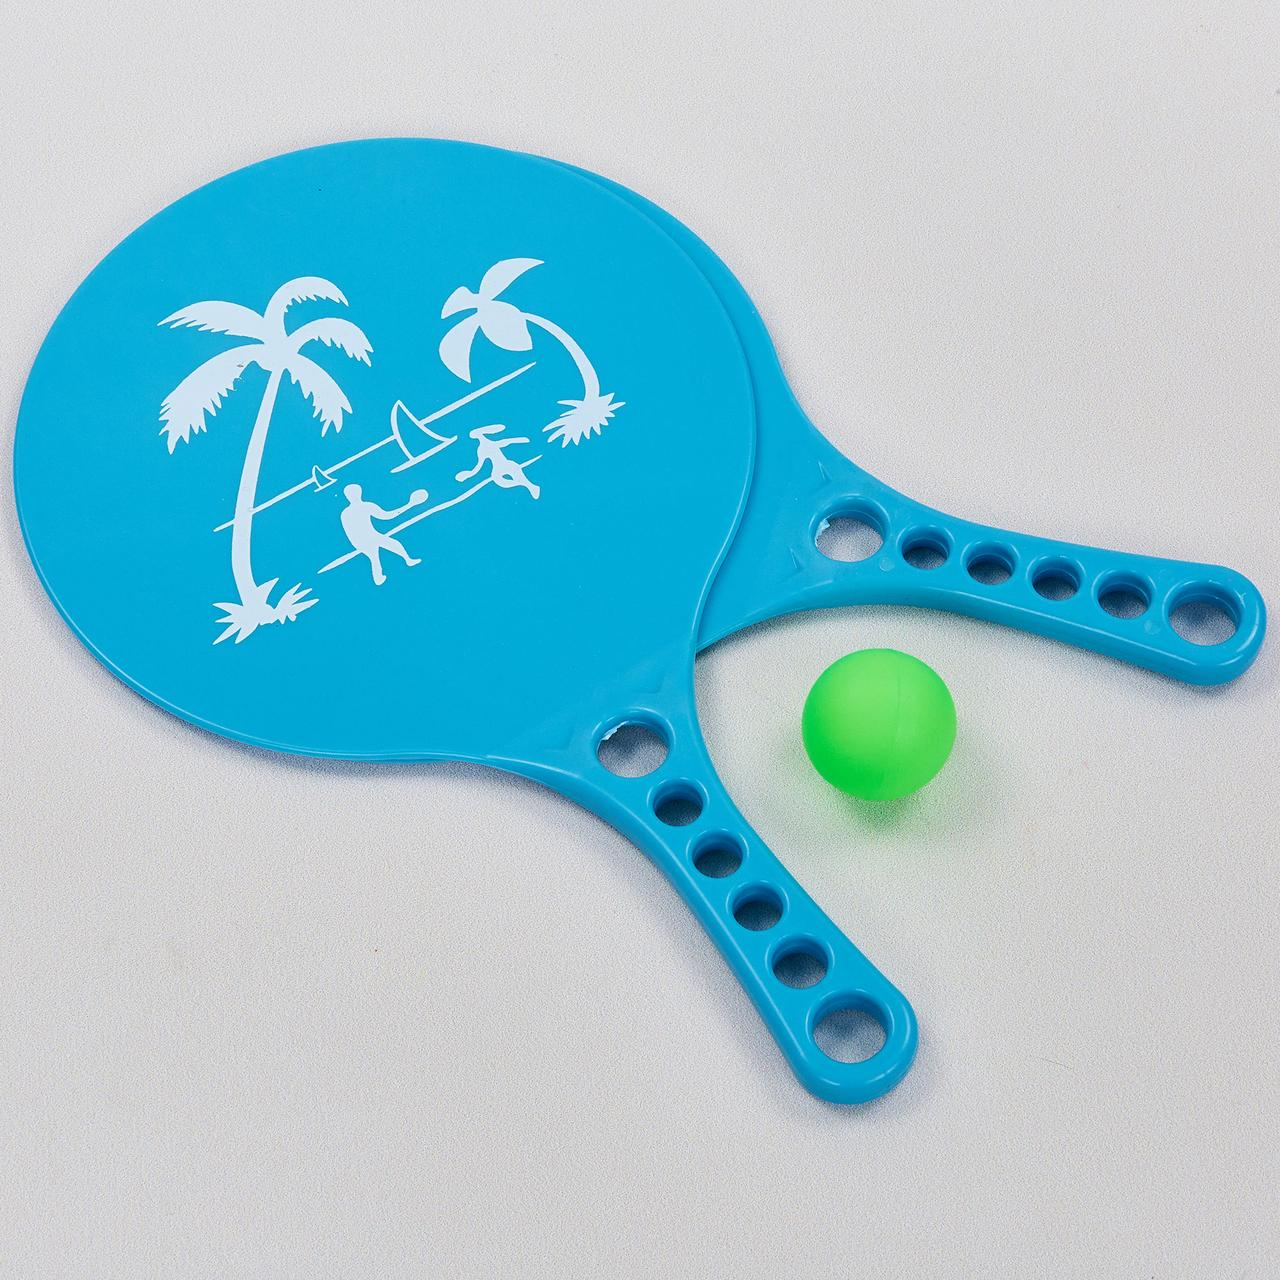 Набор ракетки и мячик для пляжного тенниса (пластик, размер 33,5x20см, 2 ракетки + 1 мячик)